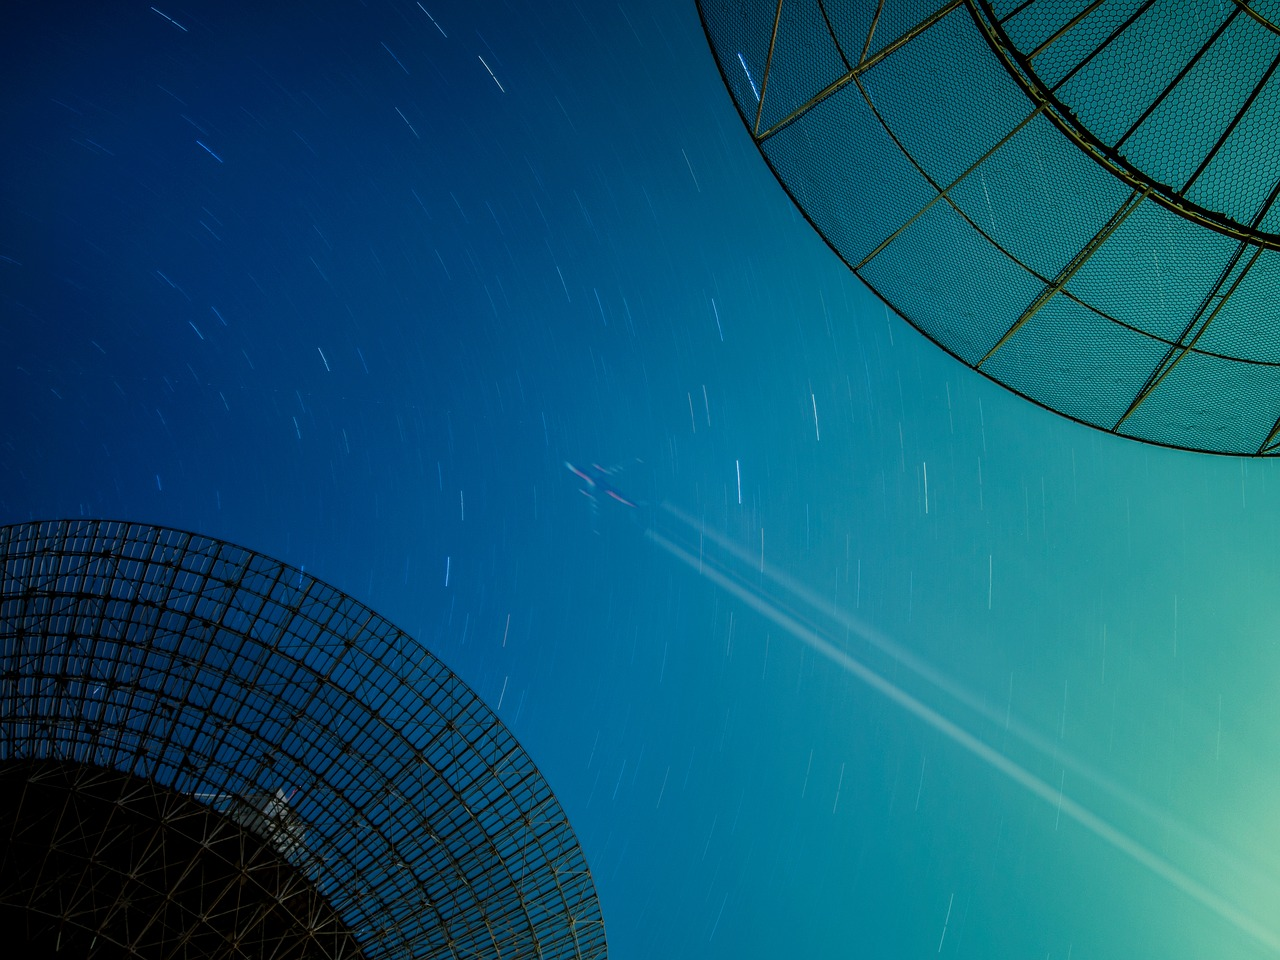 starry-sky-1664210_1280